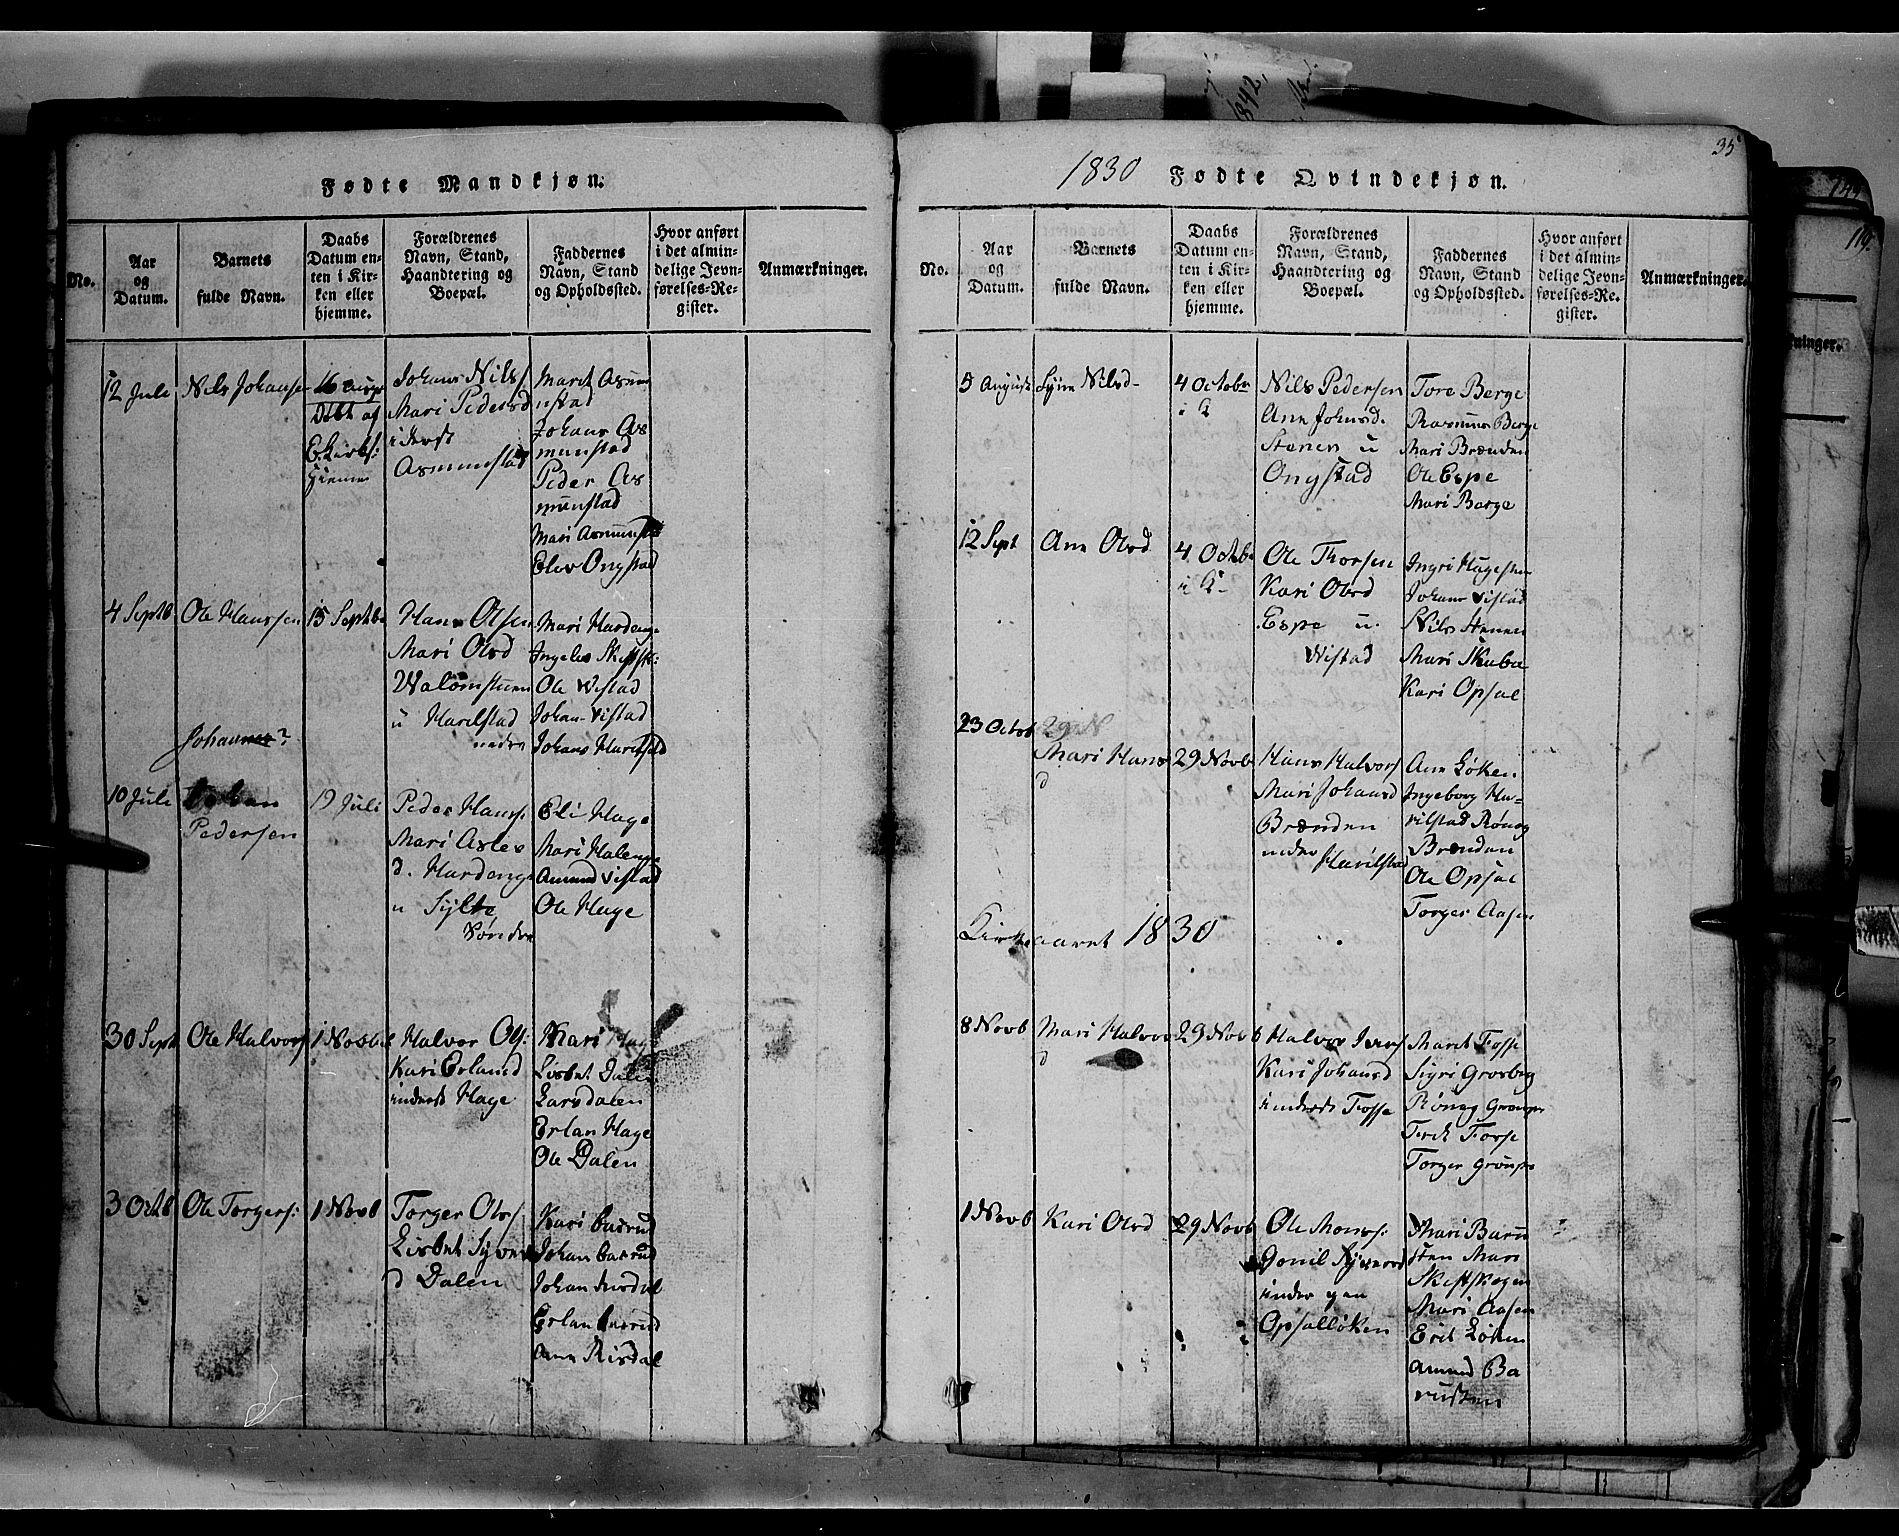 SAH, Fron prestekontor, H/Ha/Hab/L0003: Klokkerbok nr. 3, 1816-1850, s. 35